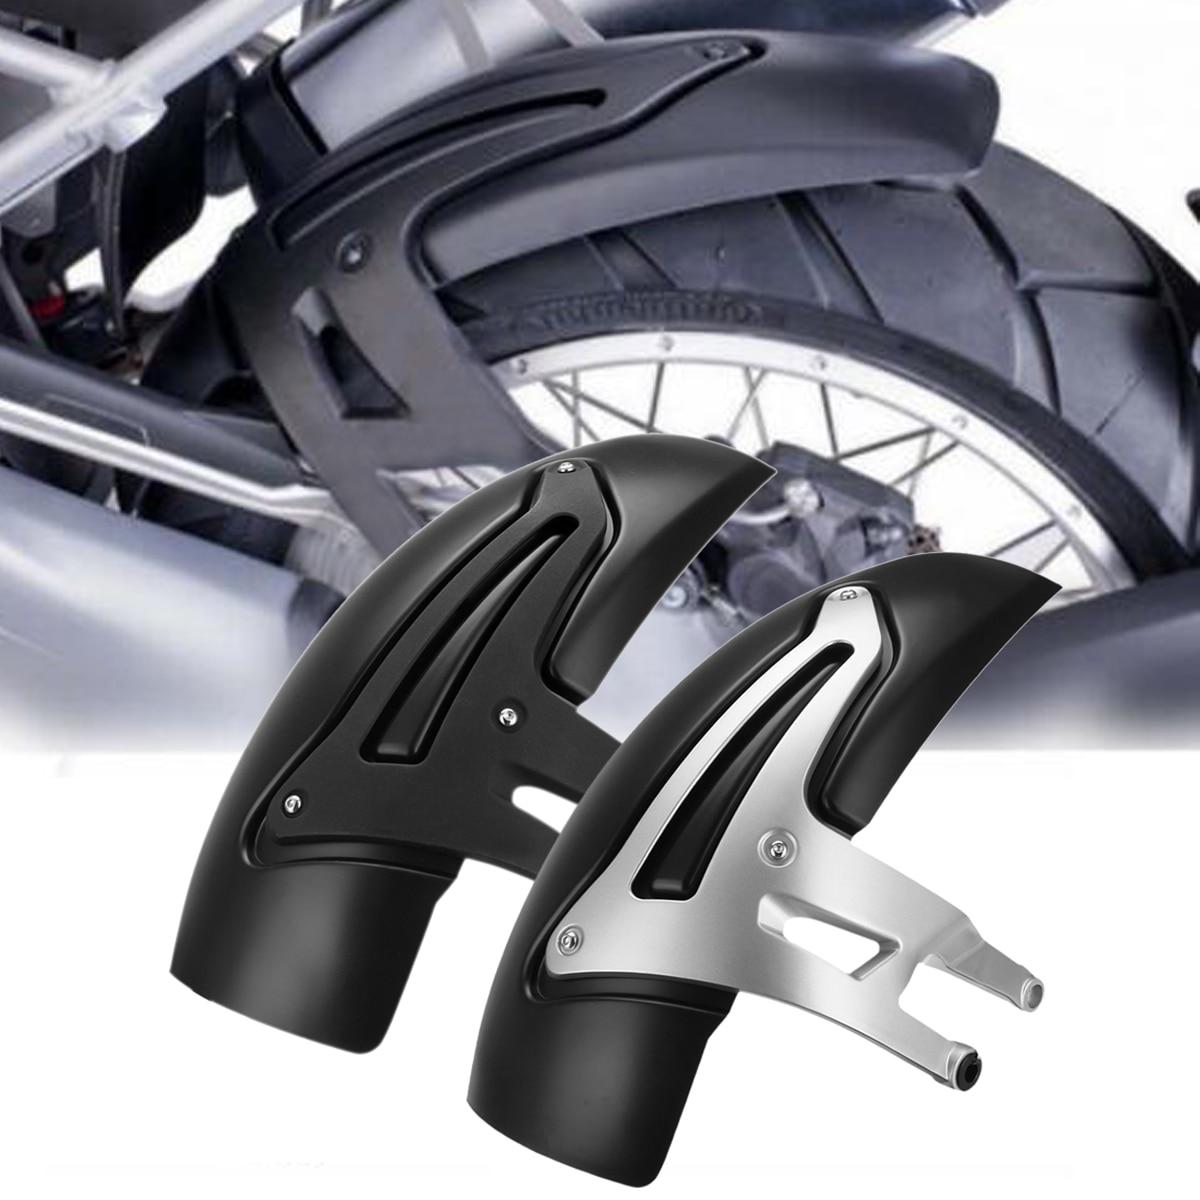 Motorcycle Mudguard Motorcycle Rear Wheel Hugger Splash Guard for BMW R1200GS LC/Adv 2013-2016 CNC